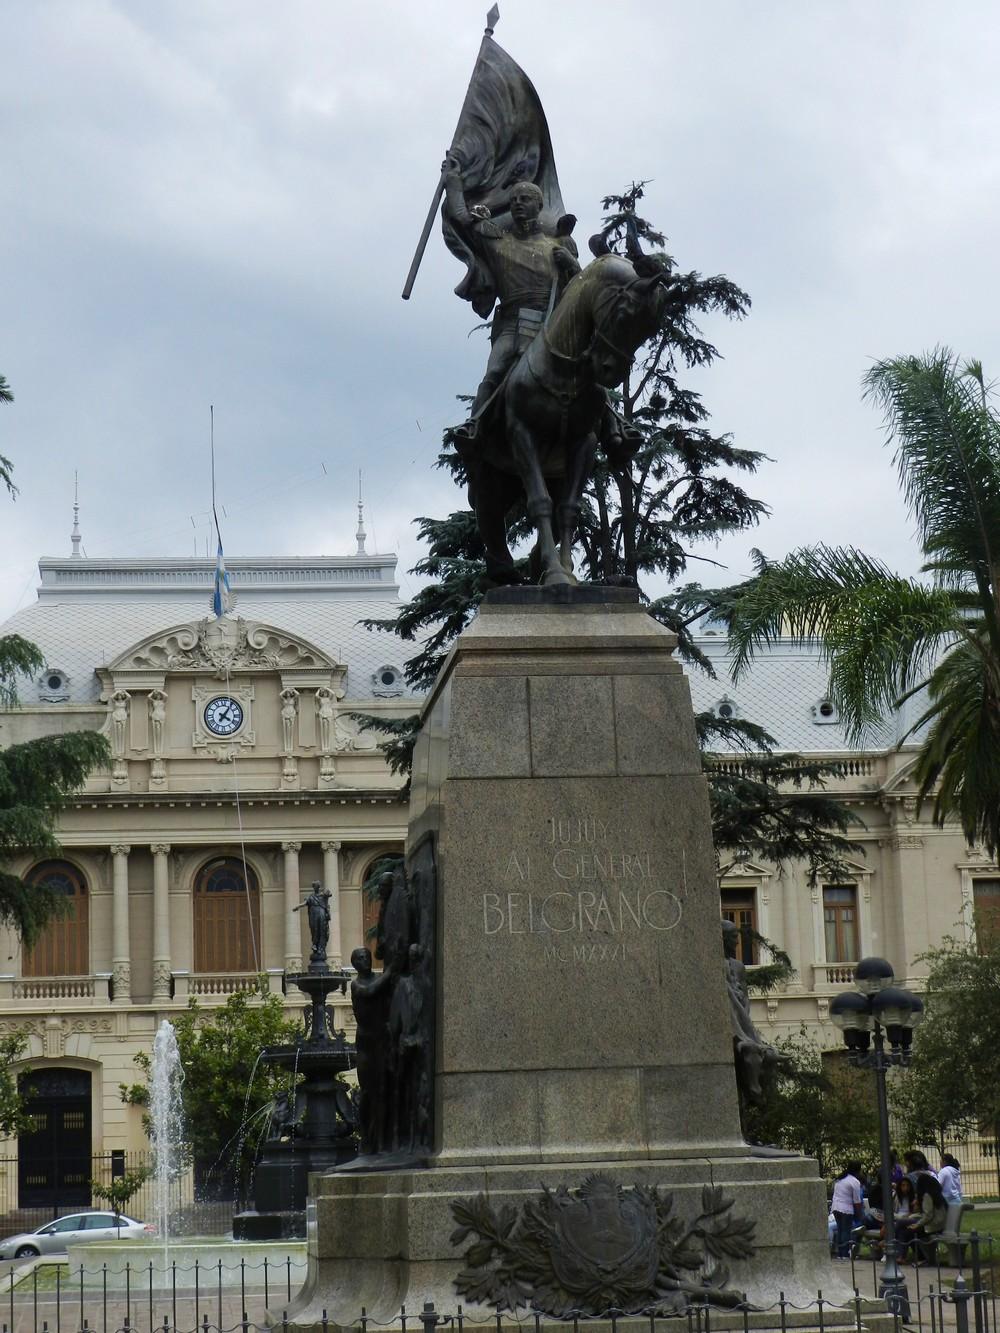 Jujuy - Plaza Belgrano